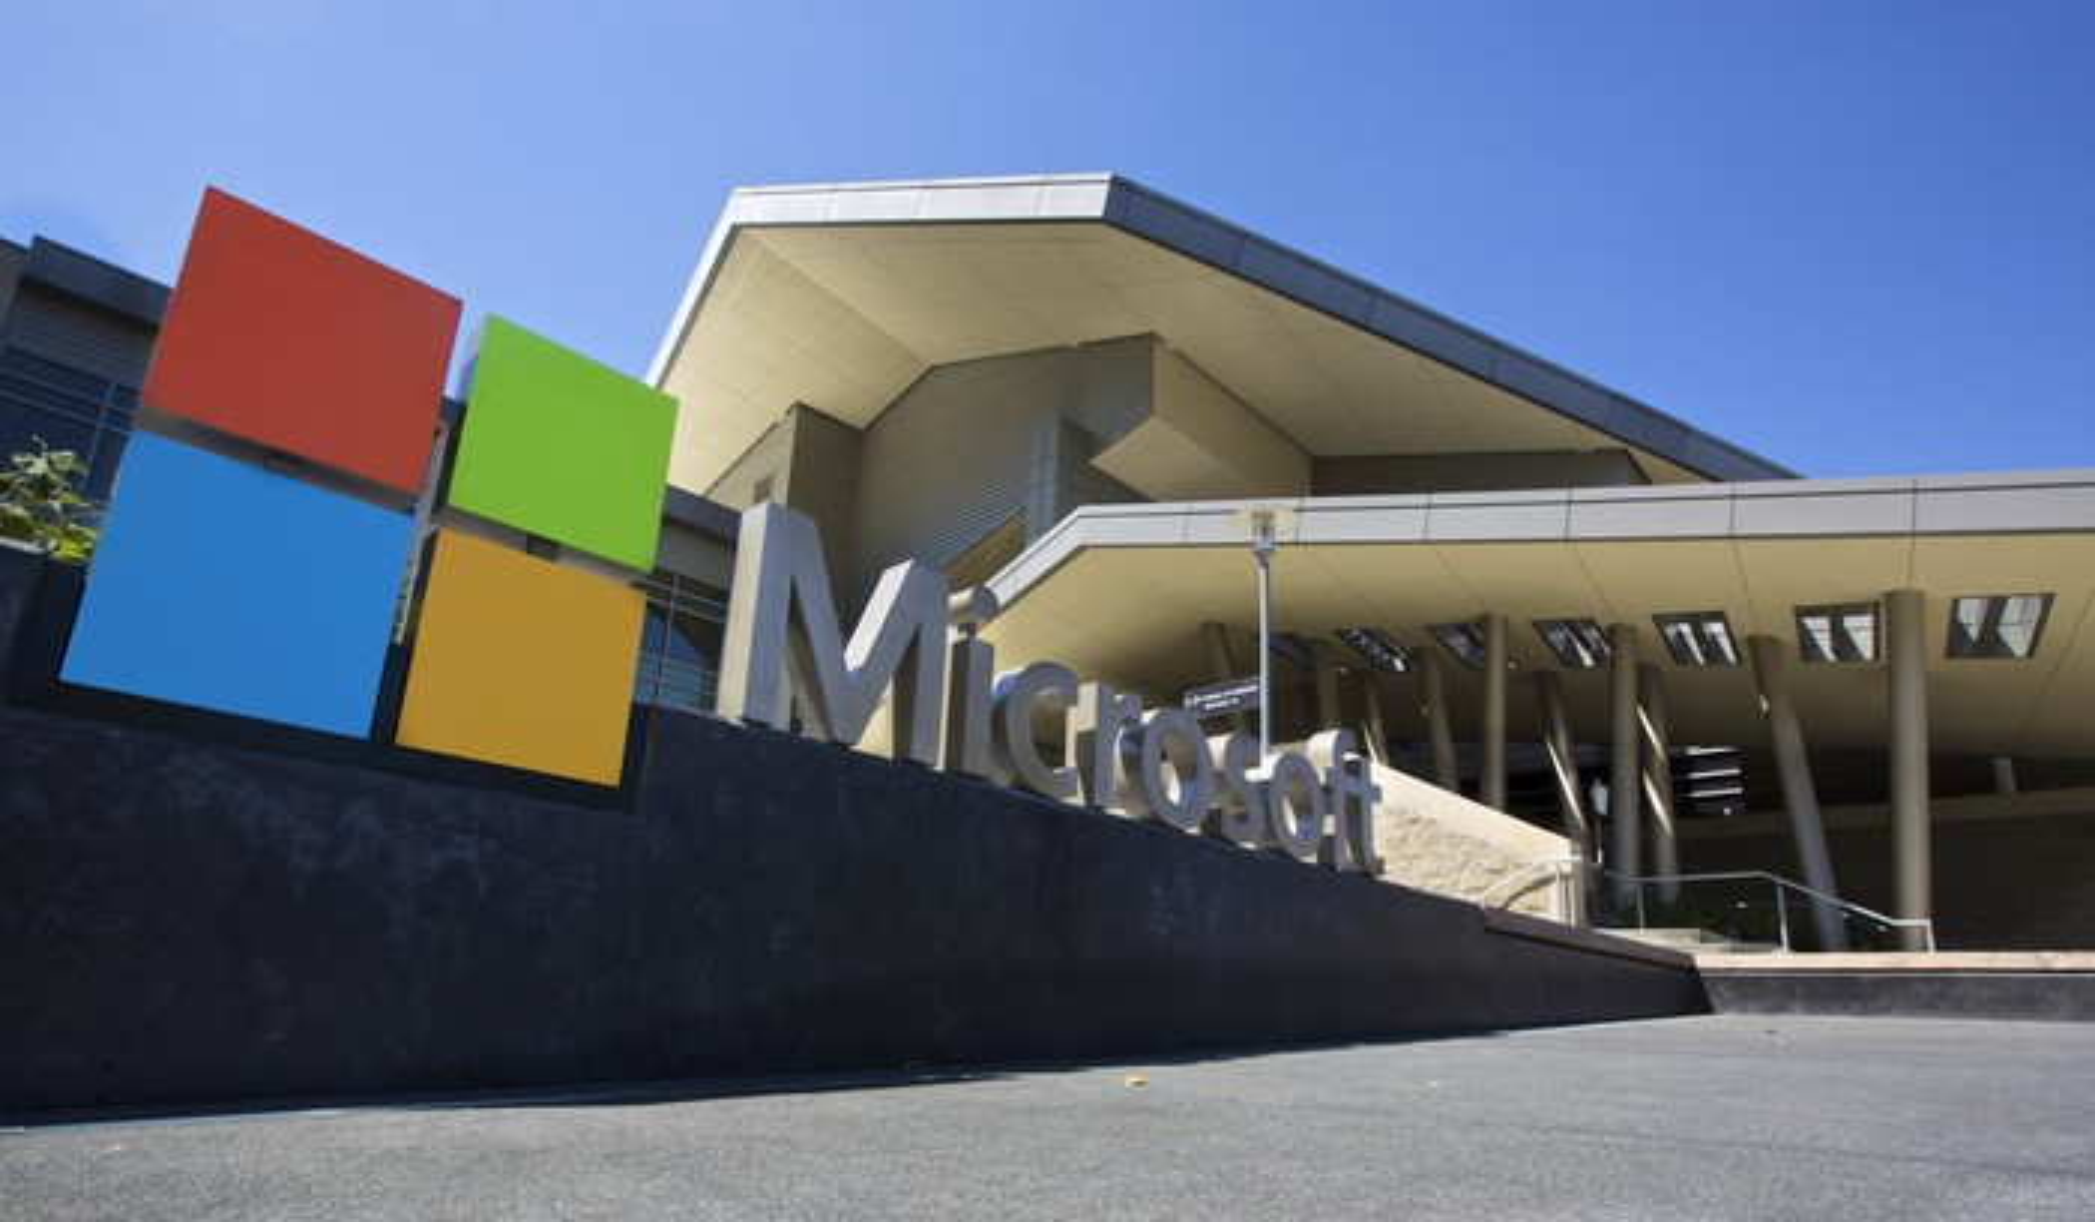 The Microsoft logo outside the company headquarters